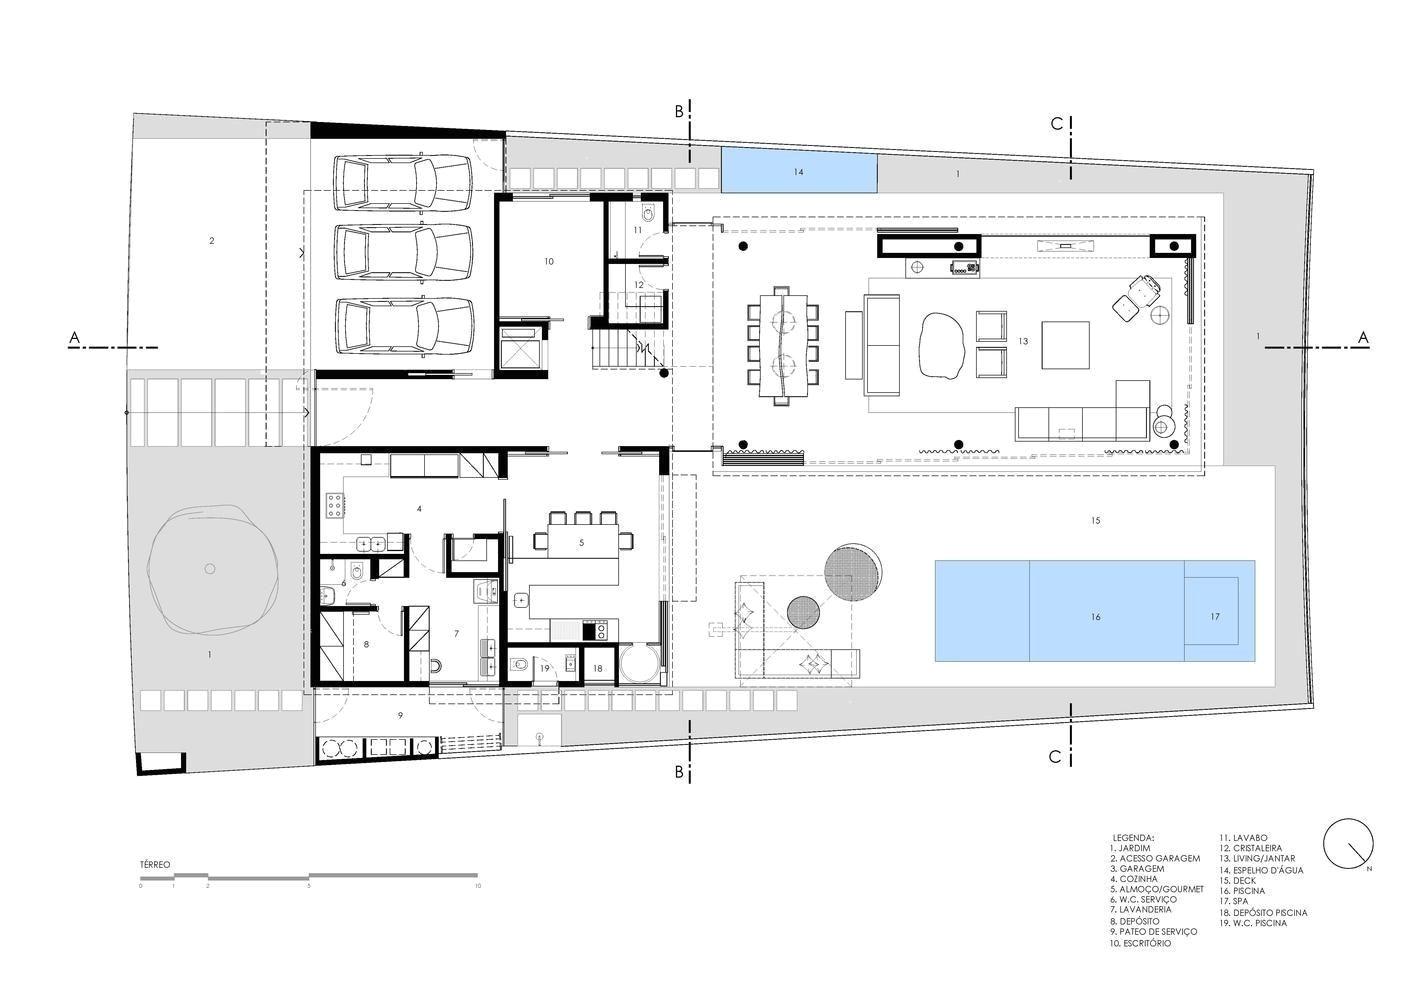 16x20 Tiny House Floor Plans | BradsHomeFurnishings